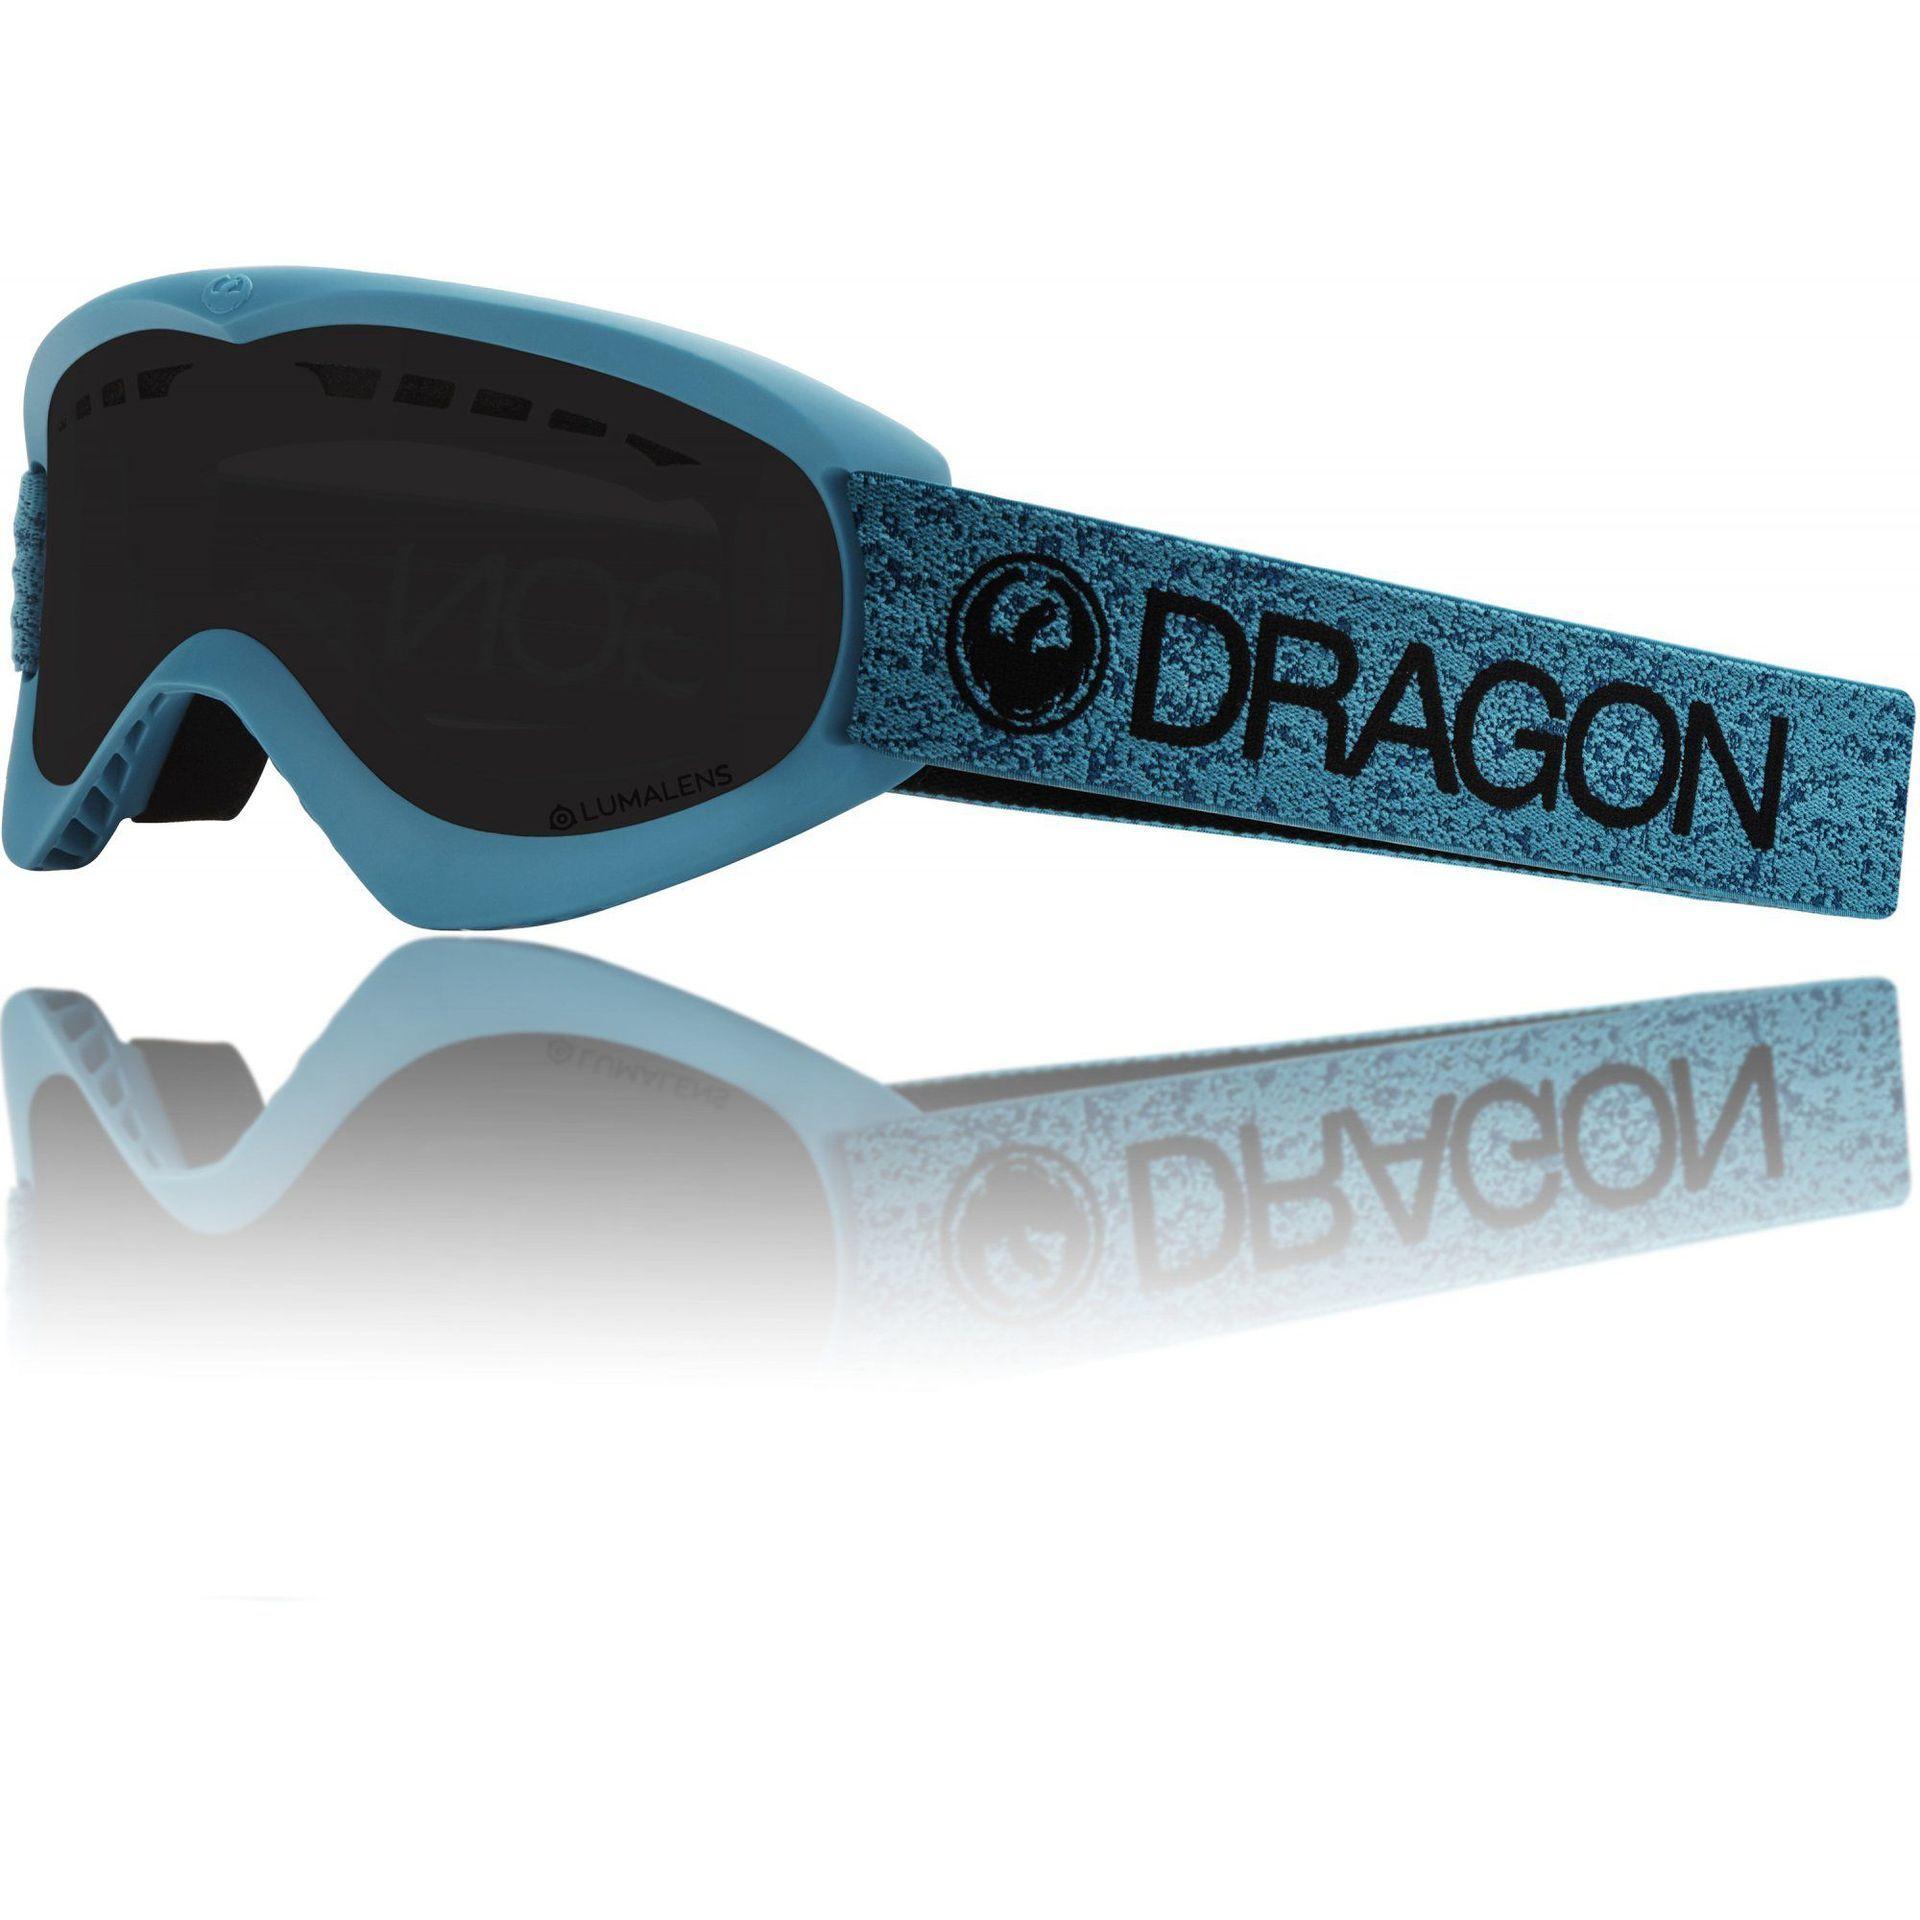 GOGLE DRAGON DX BLUE|DARK SMOKE